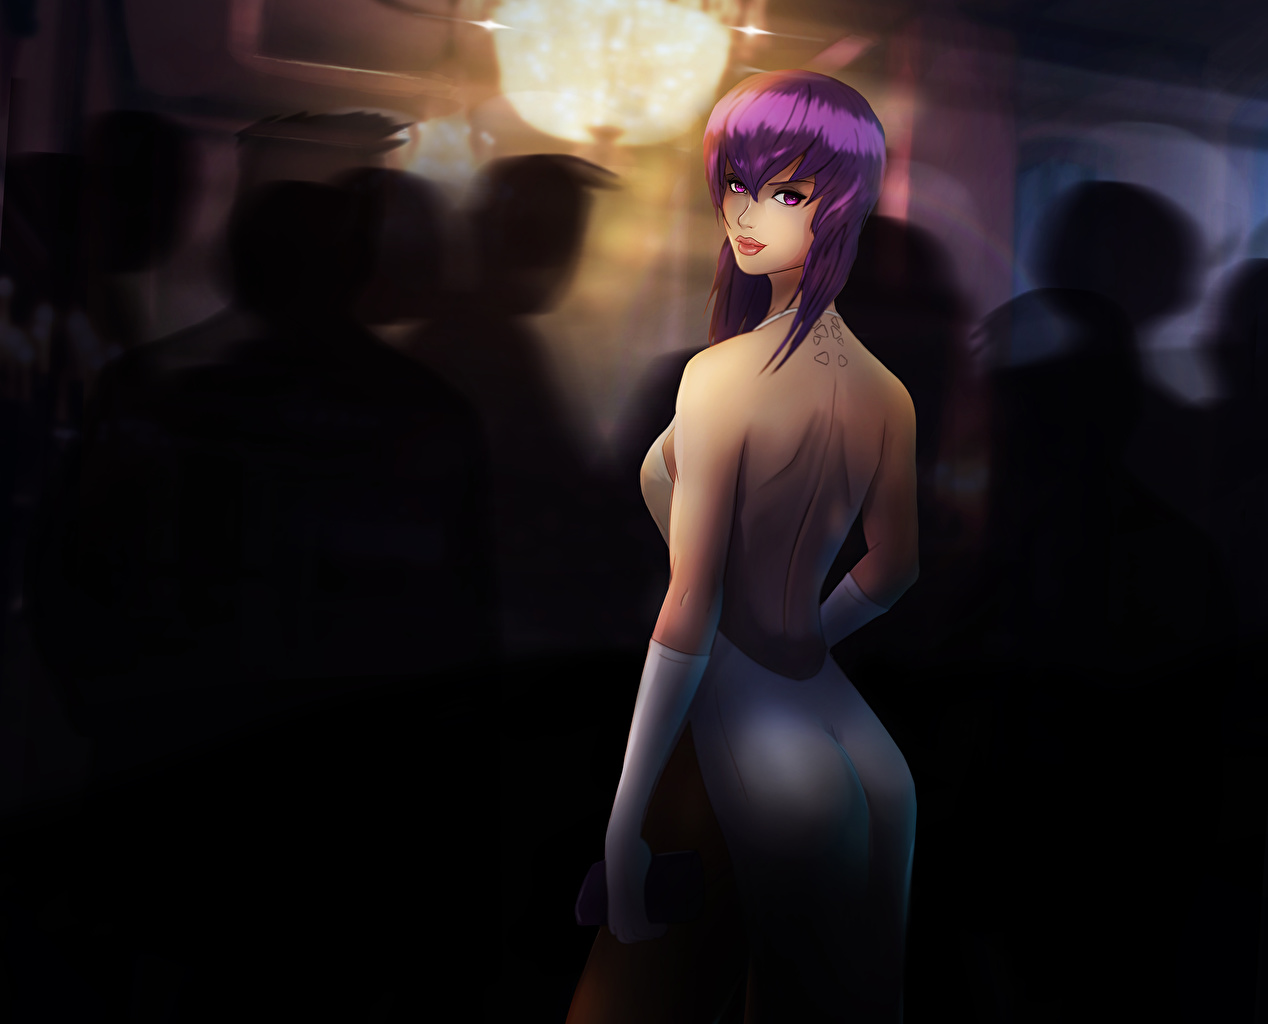 Фото Призрак в доспехах Fan ART Ghost in the Shell: Stand Alone Complex, Kusanagi Motoko Красивые Спина Девушки смотрит Рисованные Ghost in the Shell Фан АРТ Взгляд